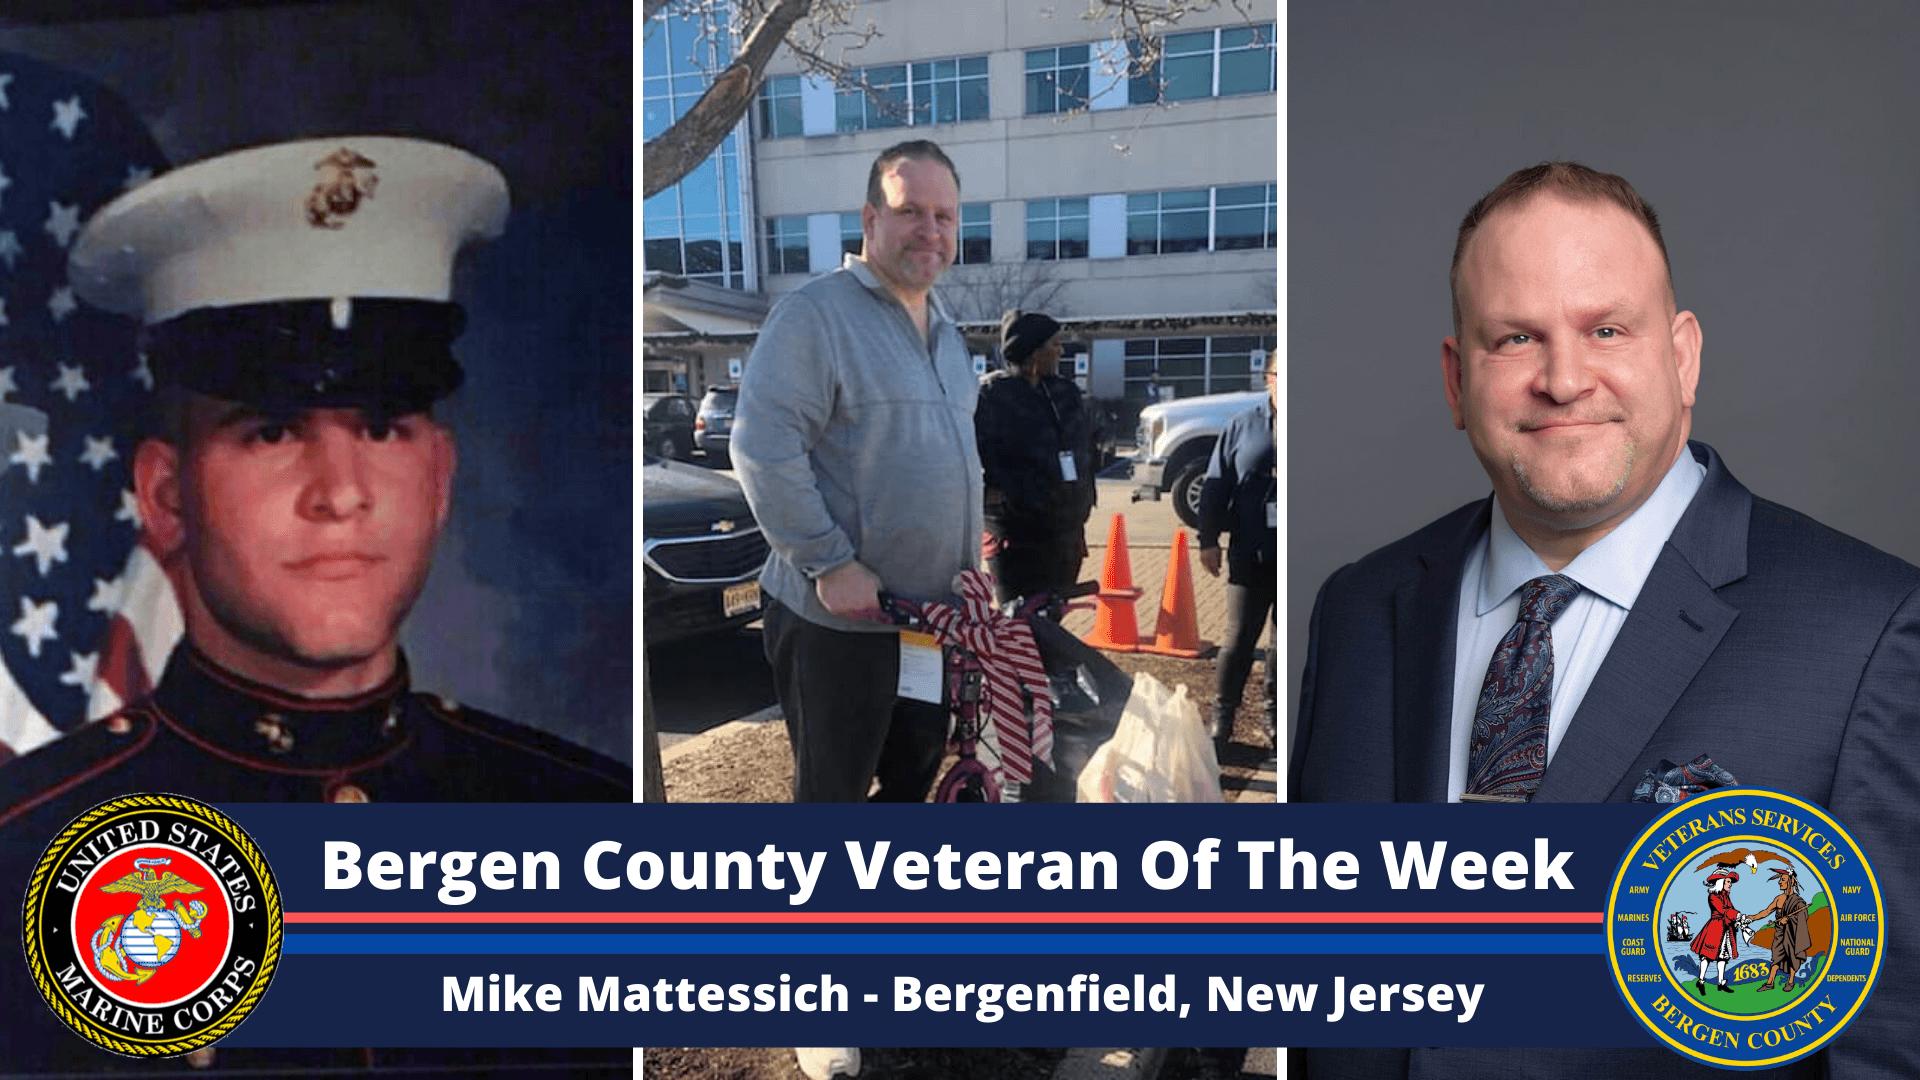 Bergen County Veteran of the Week: Mike Mattessich